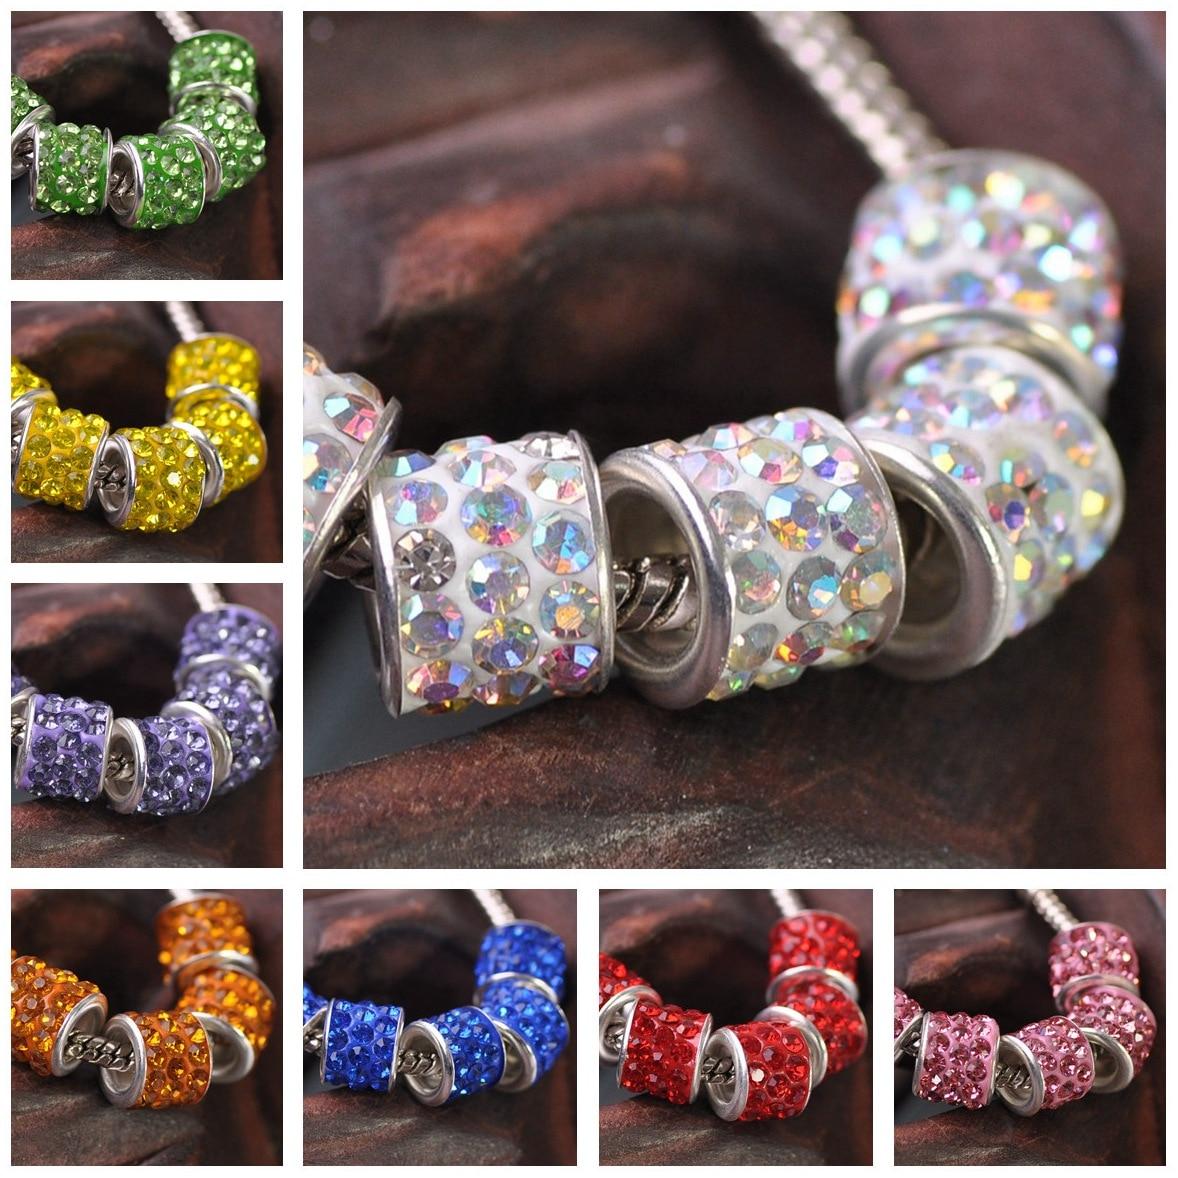 10pcs Alloy Rhinestones Big Hole Beads Fit European Charm Bracelet DIY Findings